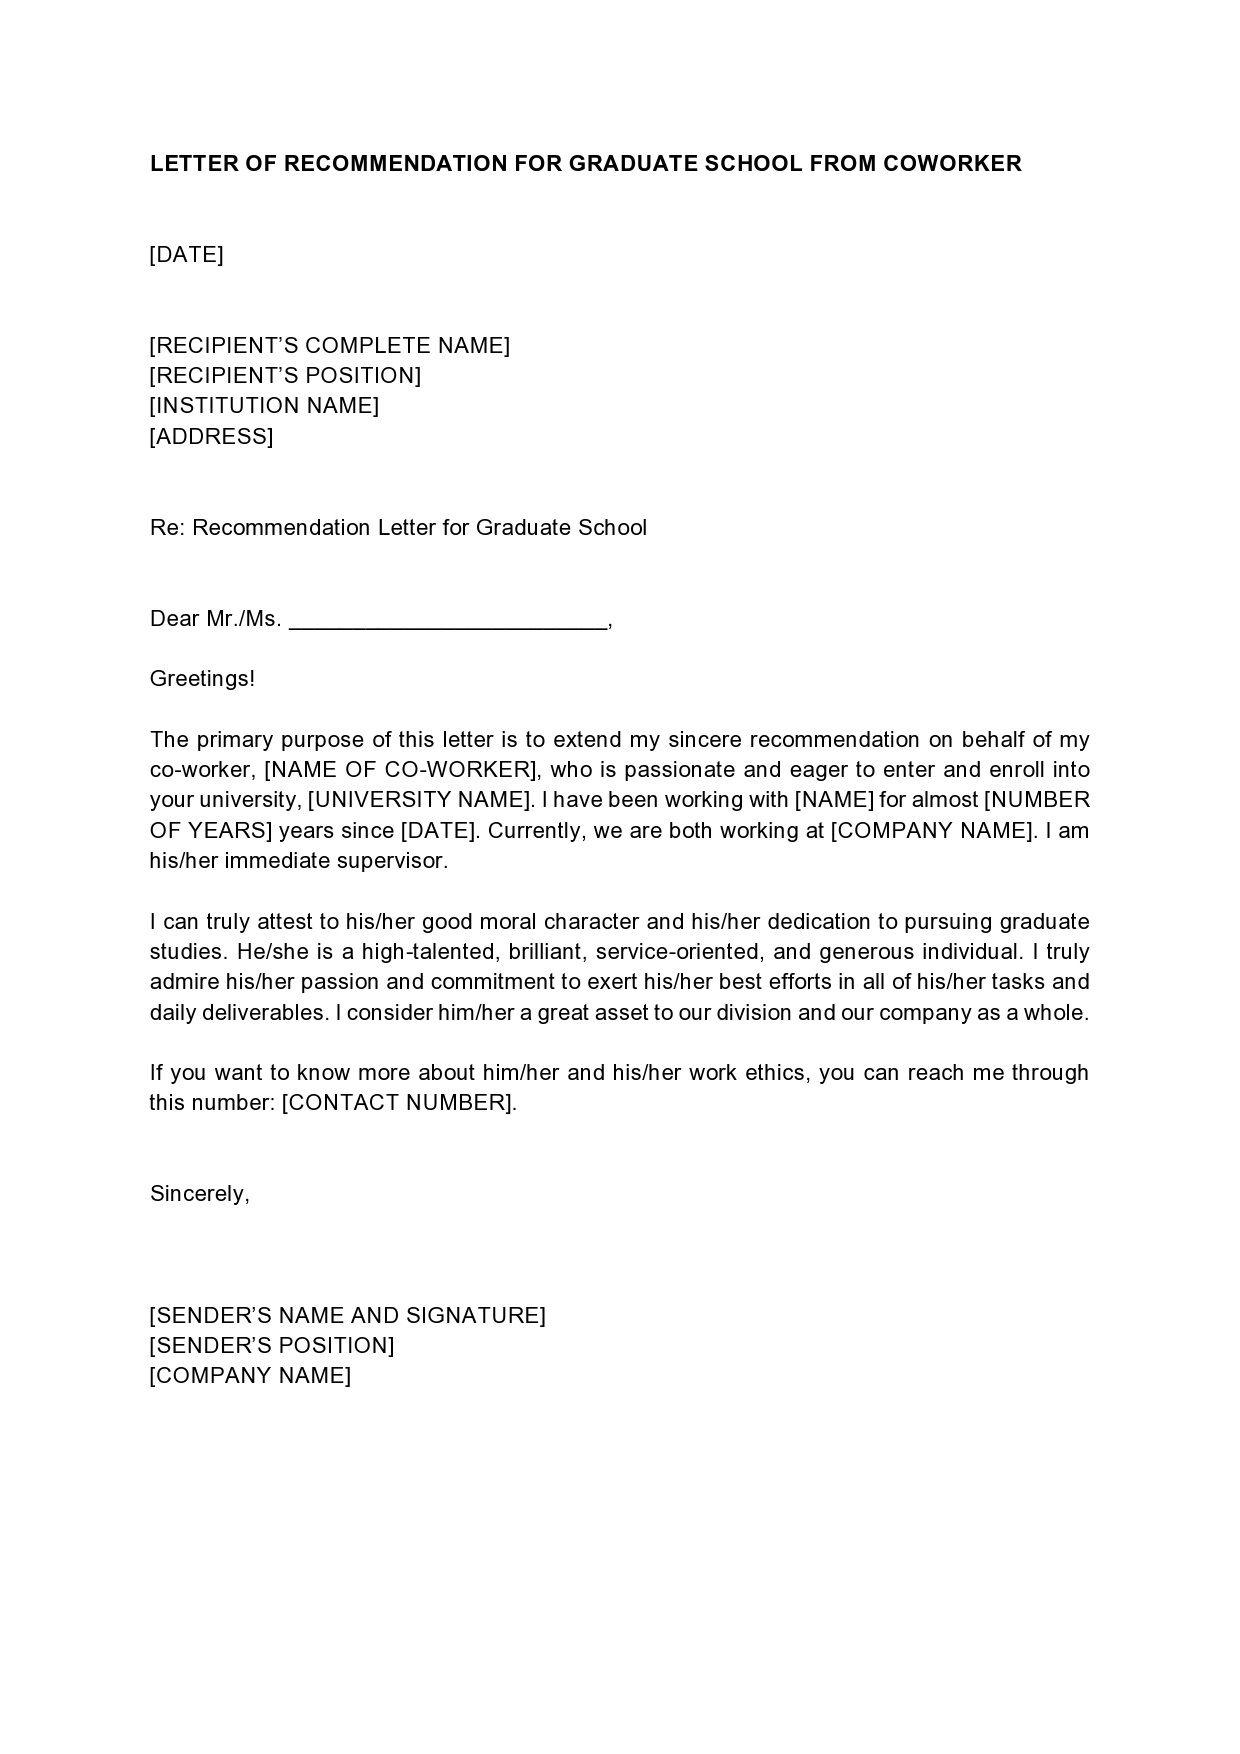 007 Dreaded Format For Letter Of Recommendation Sample High Def  SamplesFull